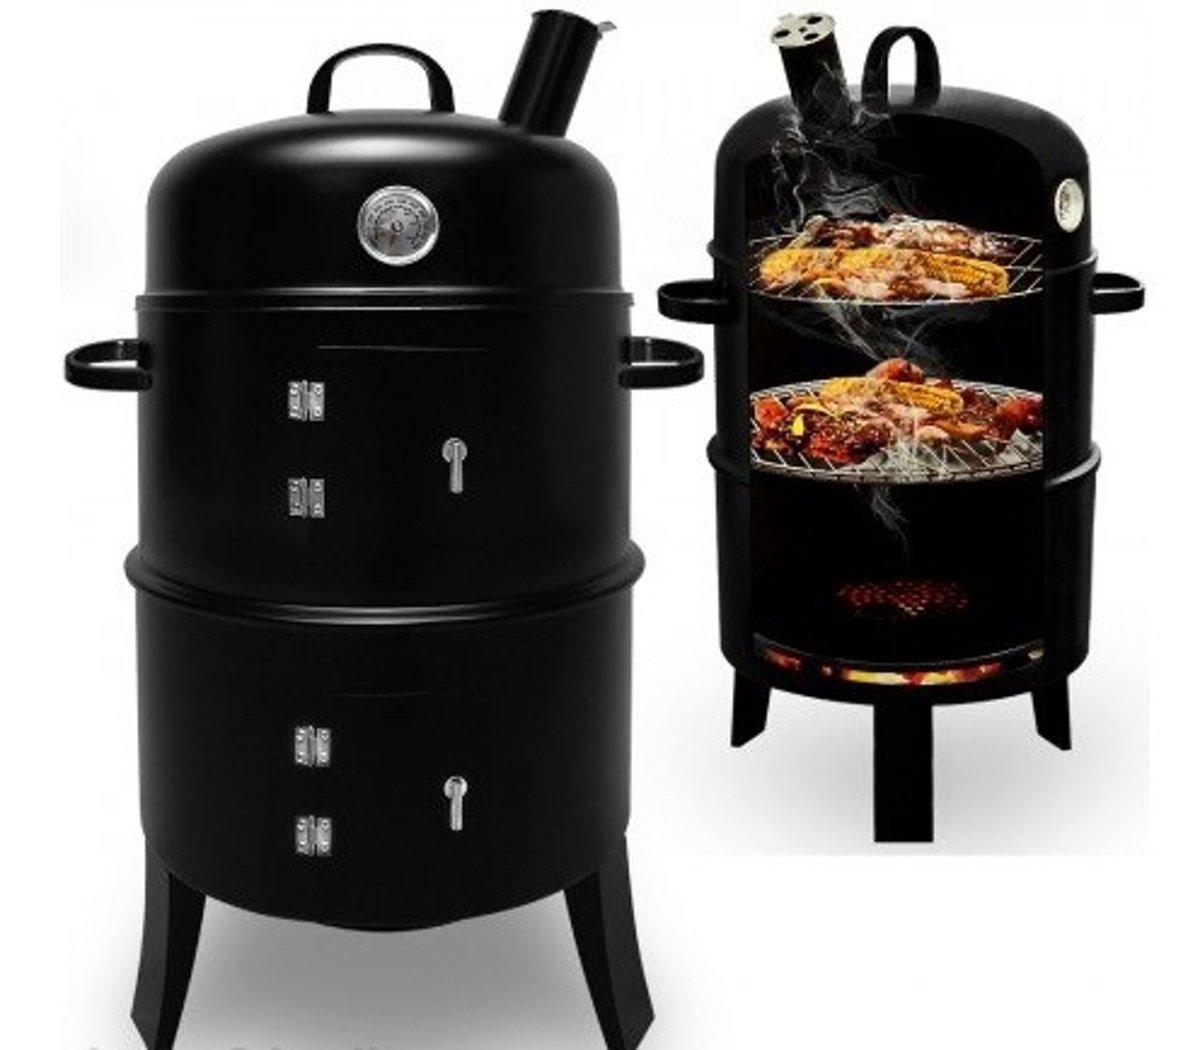 Monzana Barbecue-ROKER-Grill-Oven kopen